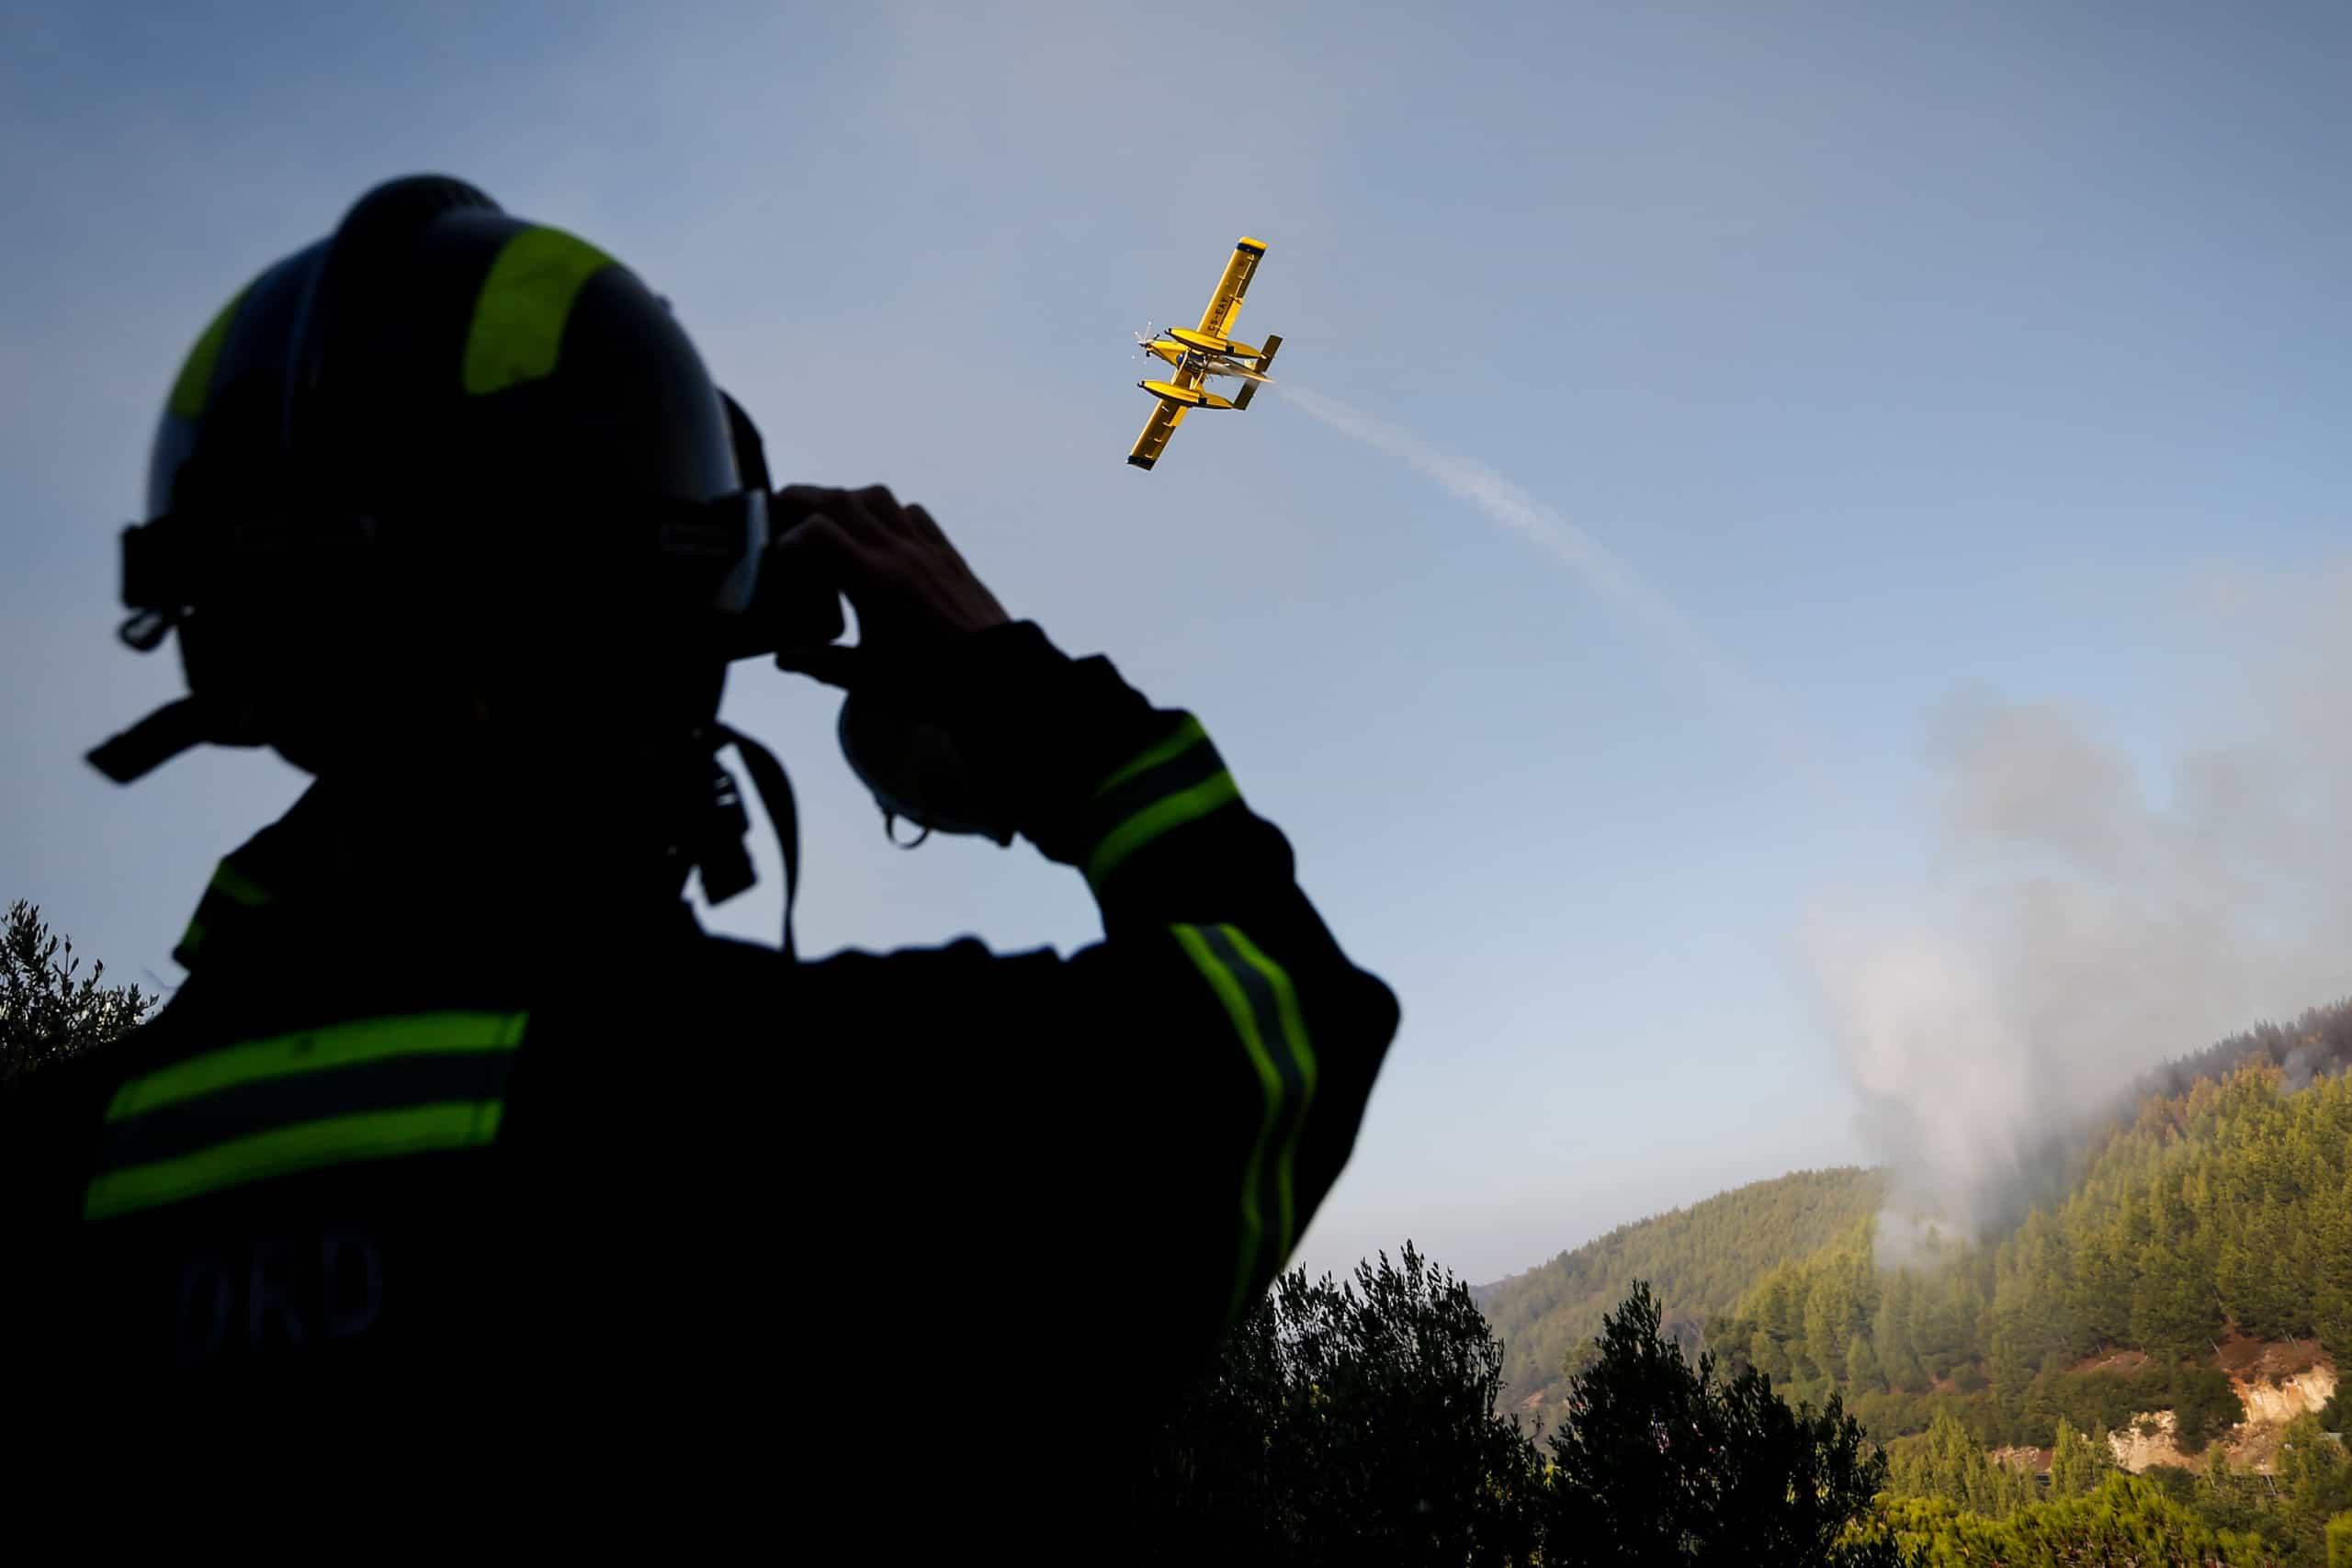 Fogo na serra de Sintra dominado